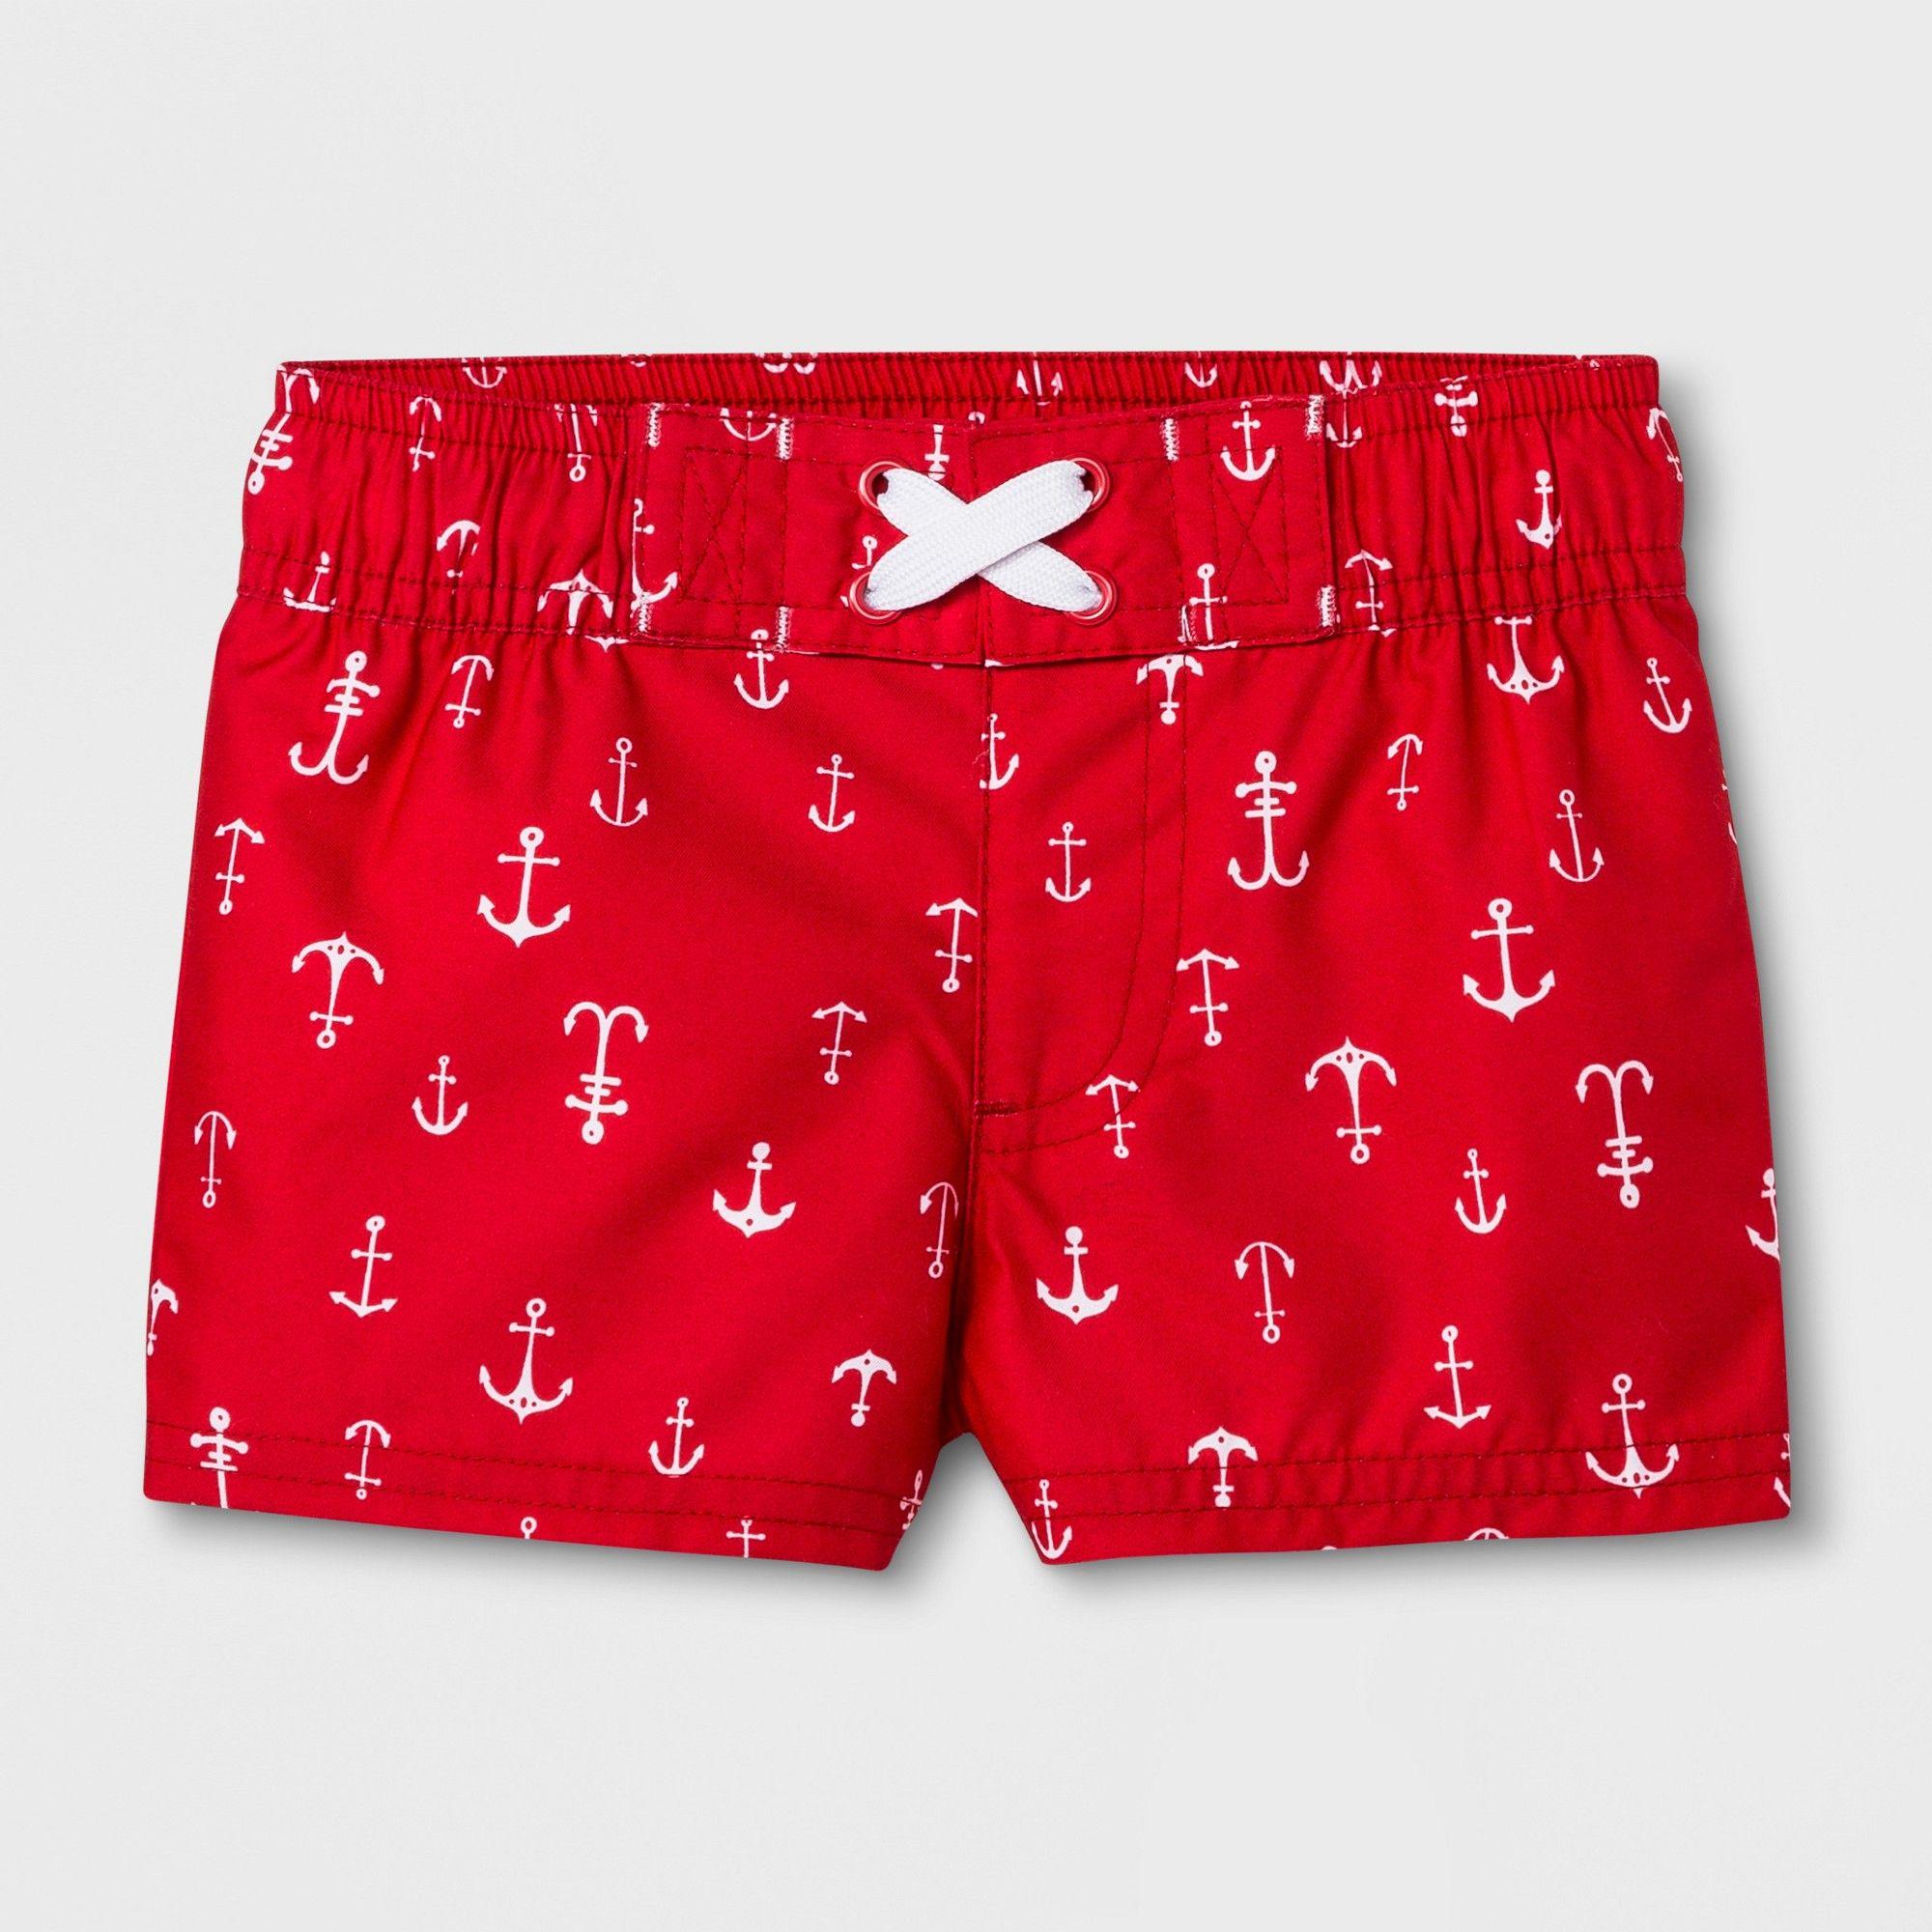 9954e85698 Baby Boys' Anchor Swim Trunks - Cat & Jack Red 12-18M in 2019 ...